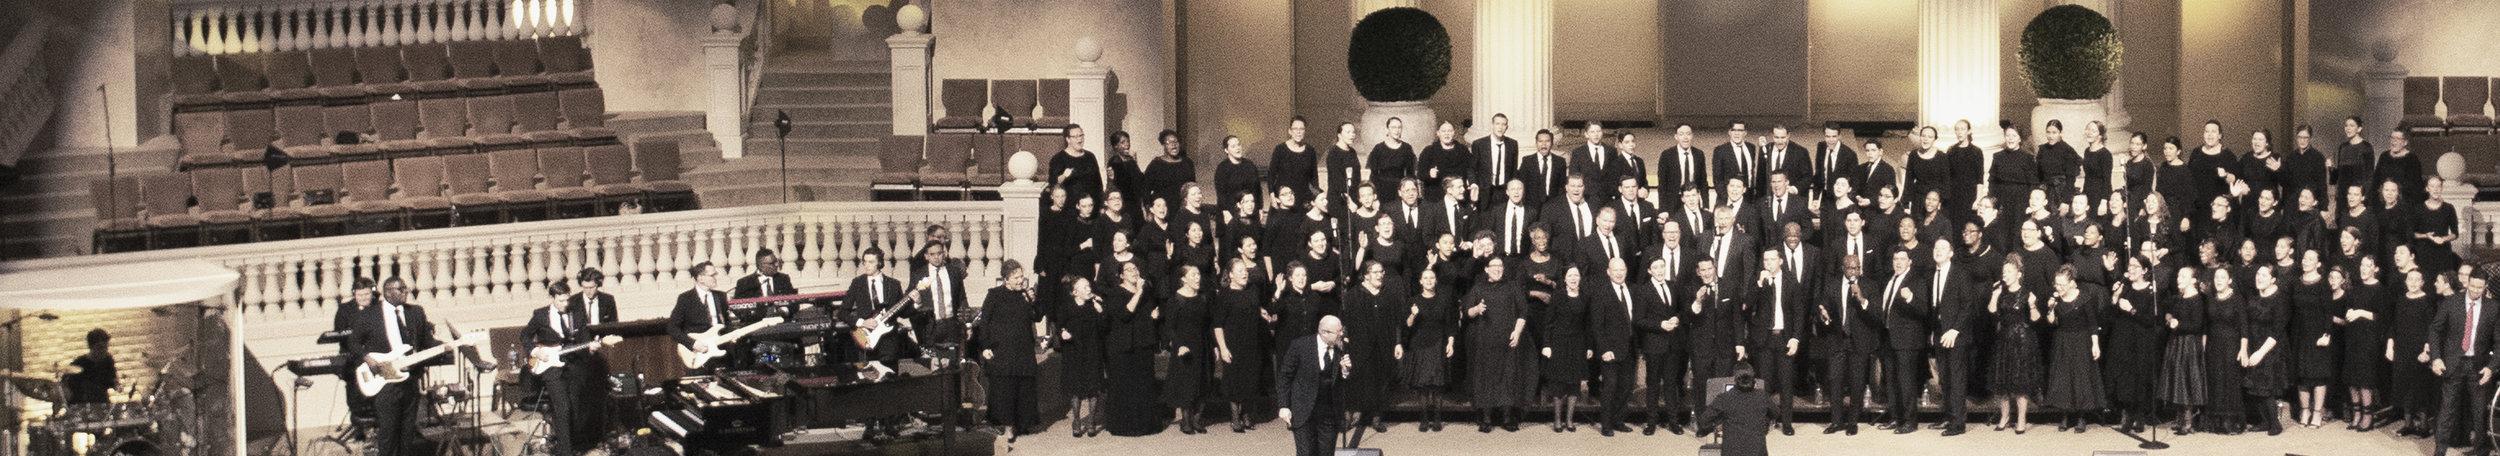 mass_choir_band_cm_2018.jpg